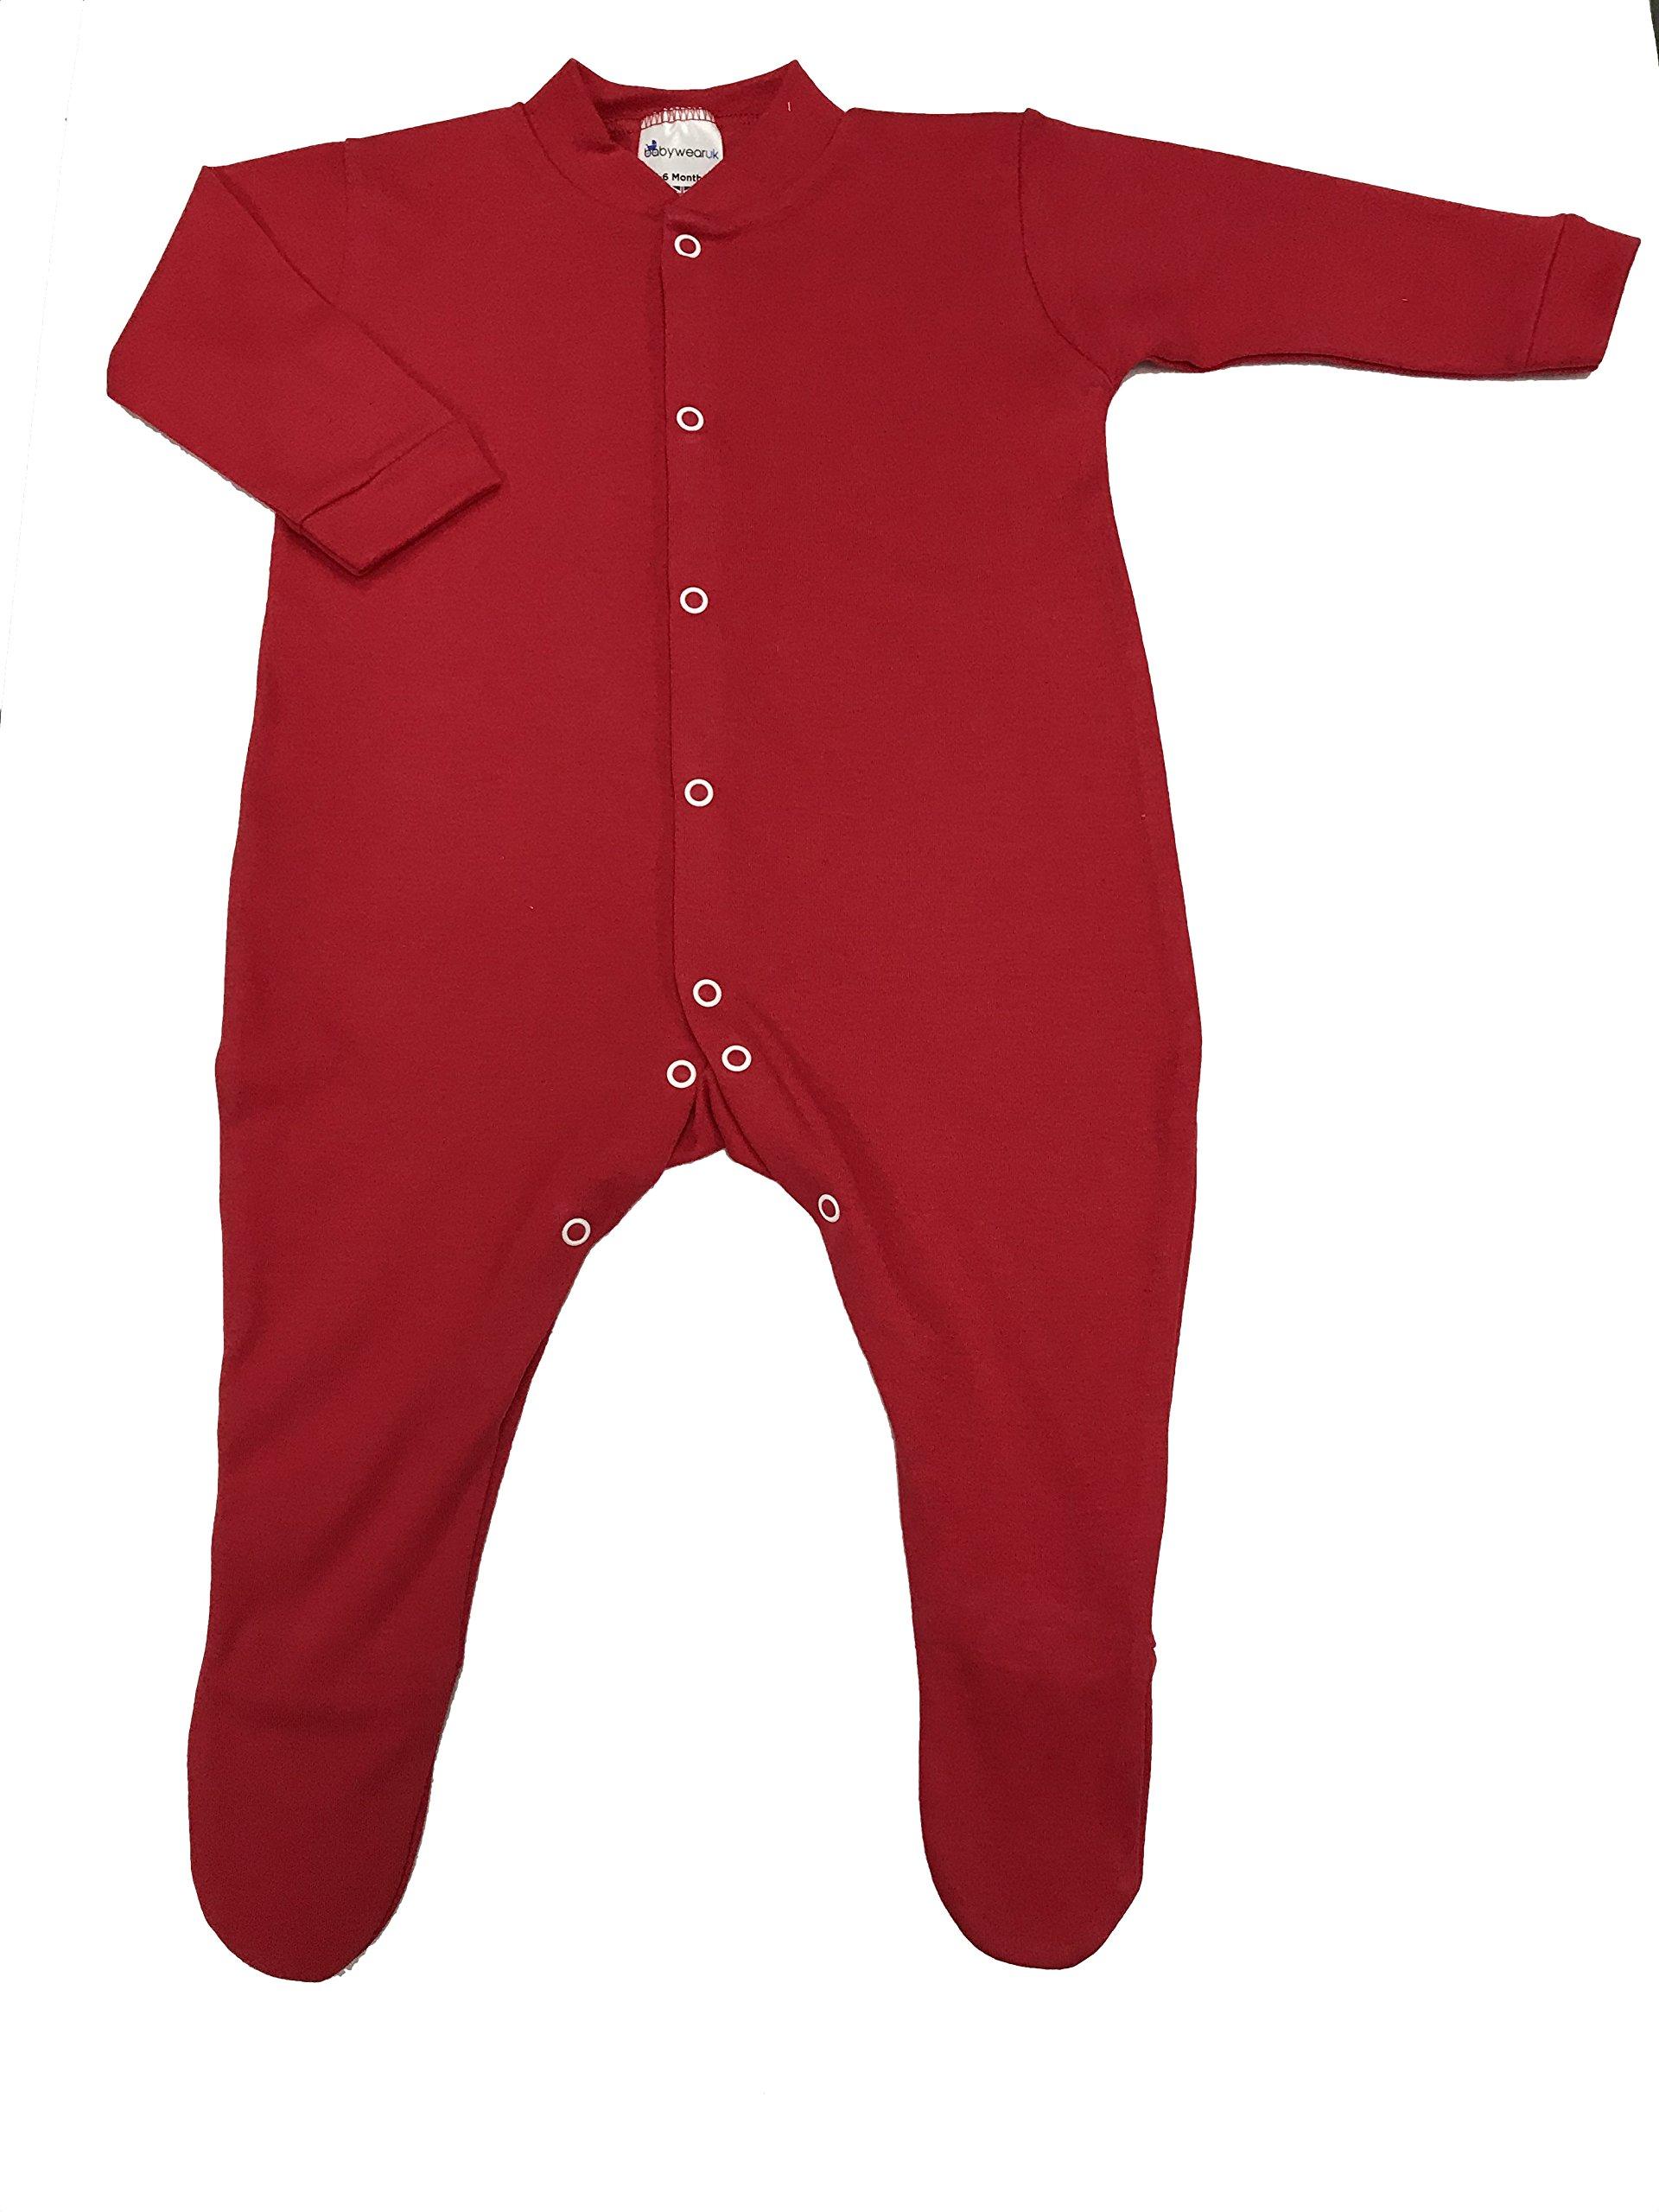 babywearuk Pijama de rojo British Made rojo rojo Talla:Prem 1